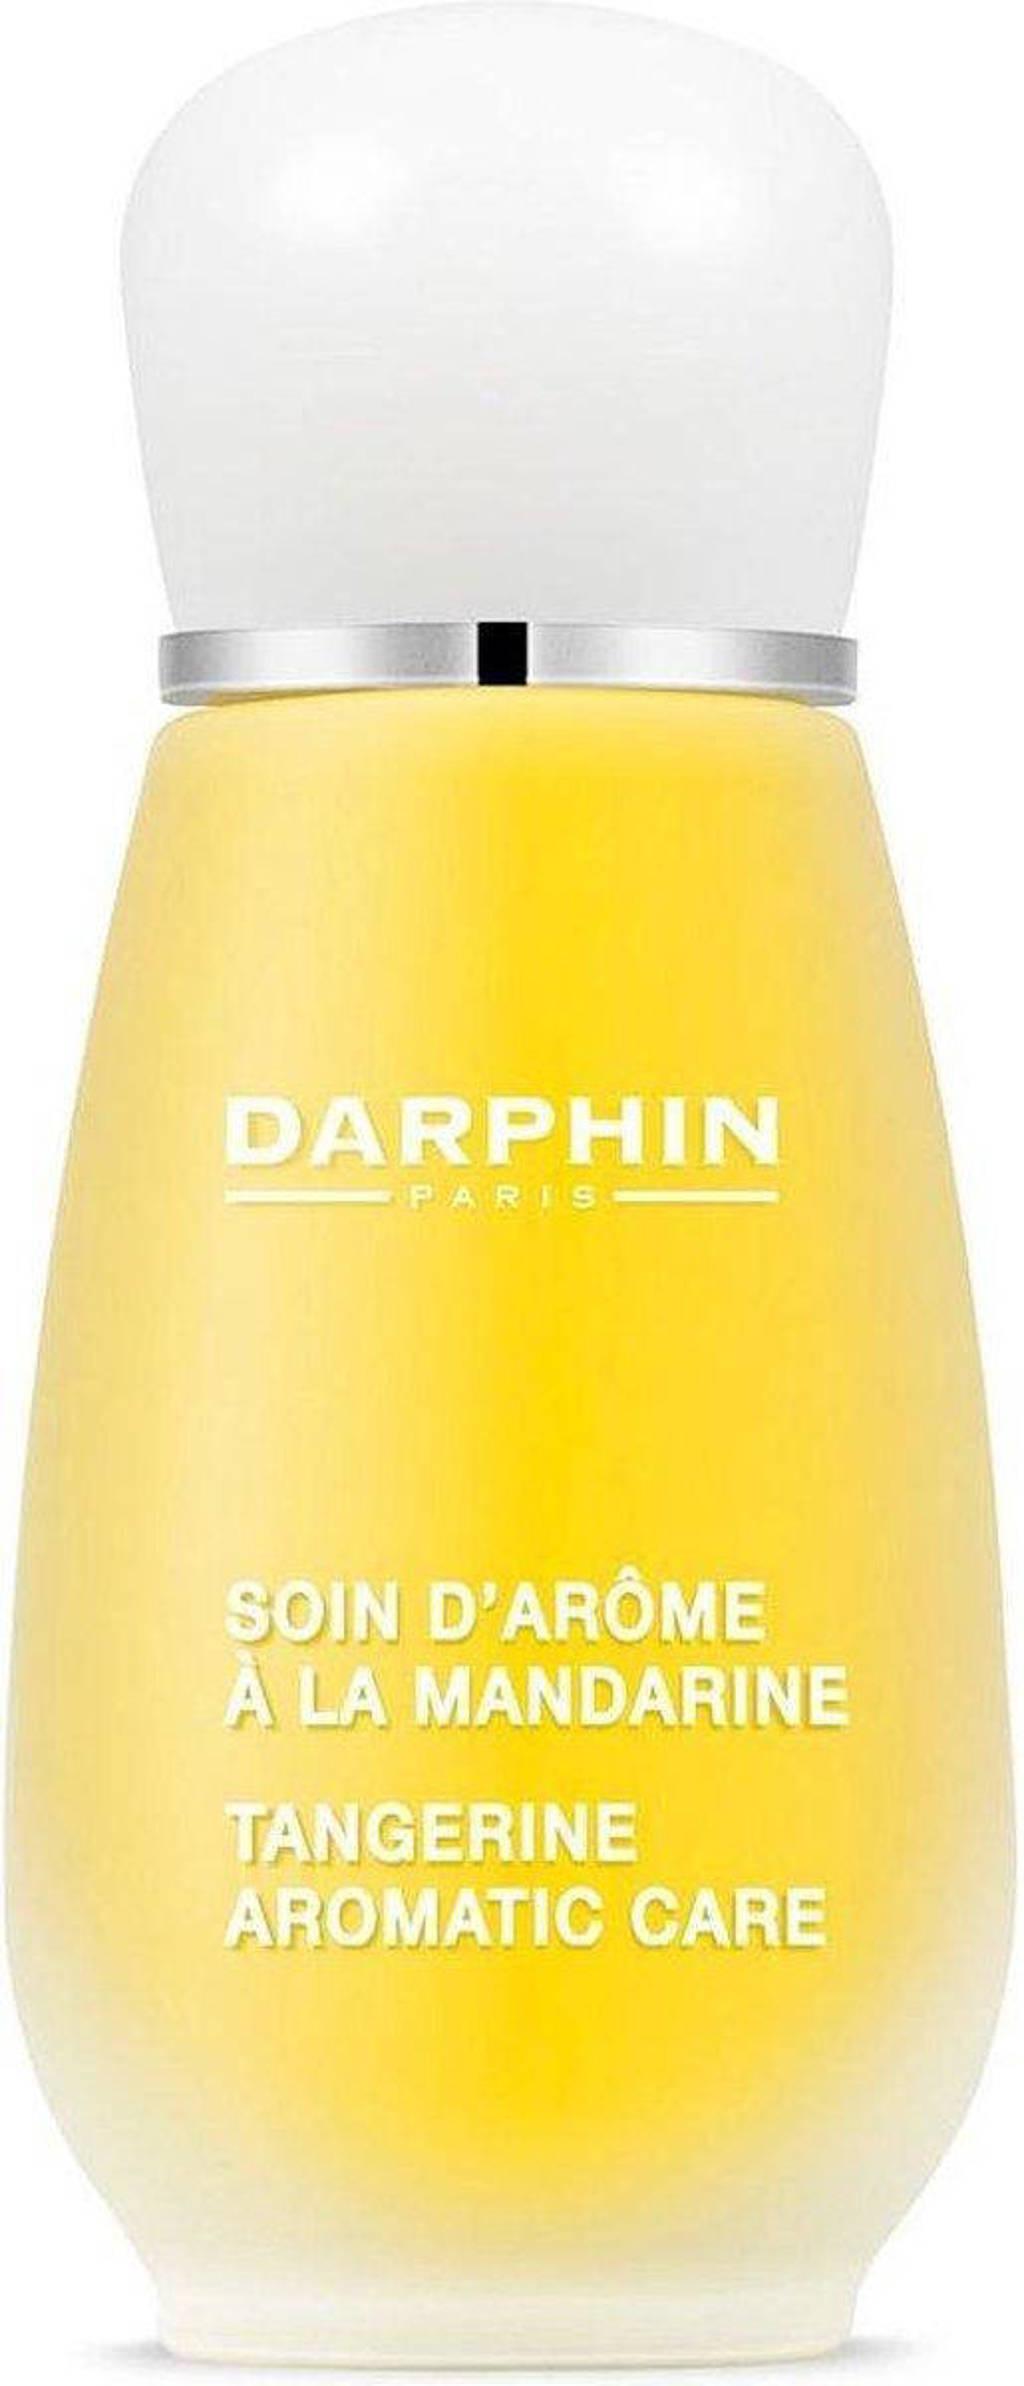 Darphin Tangerine aromatic care